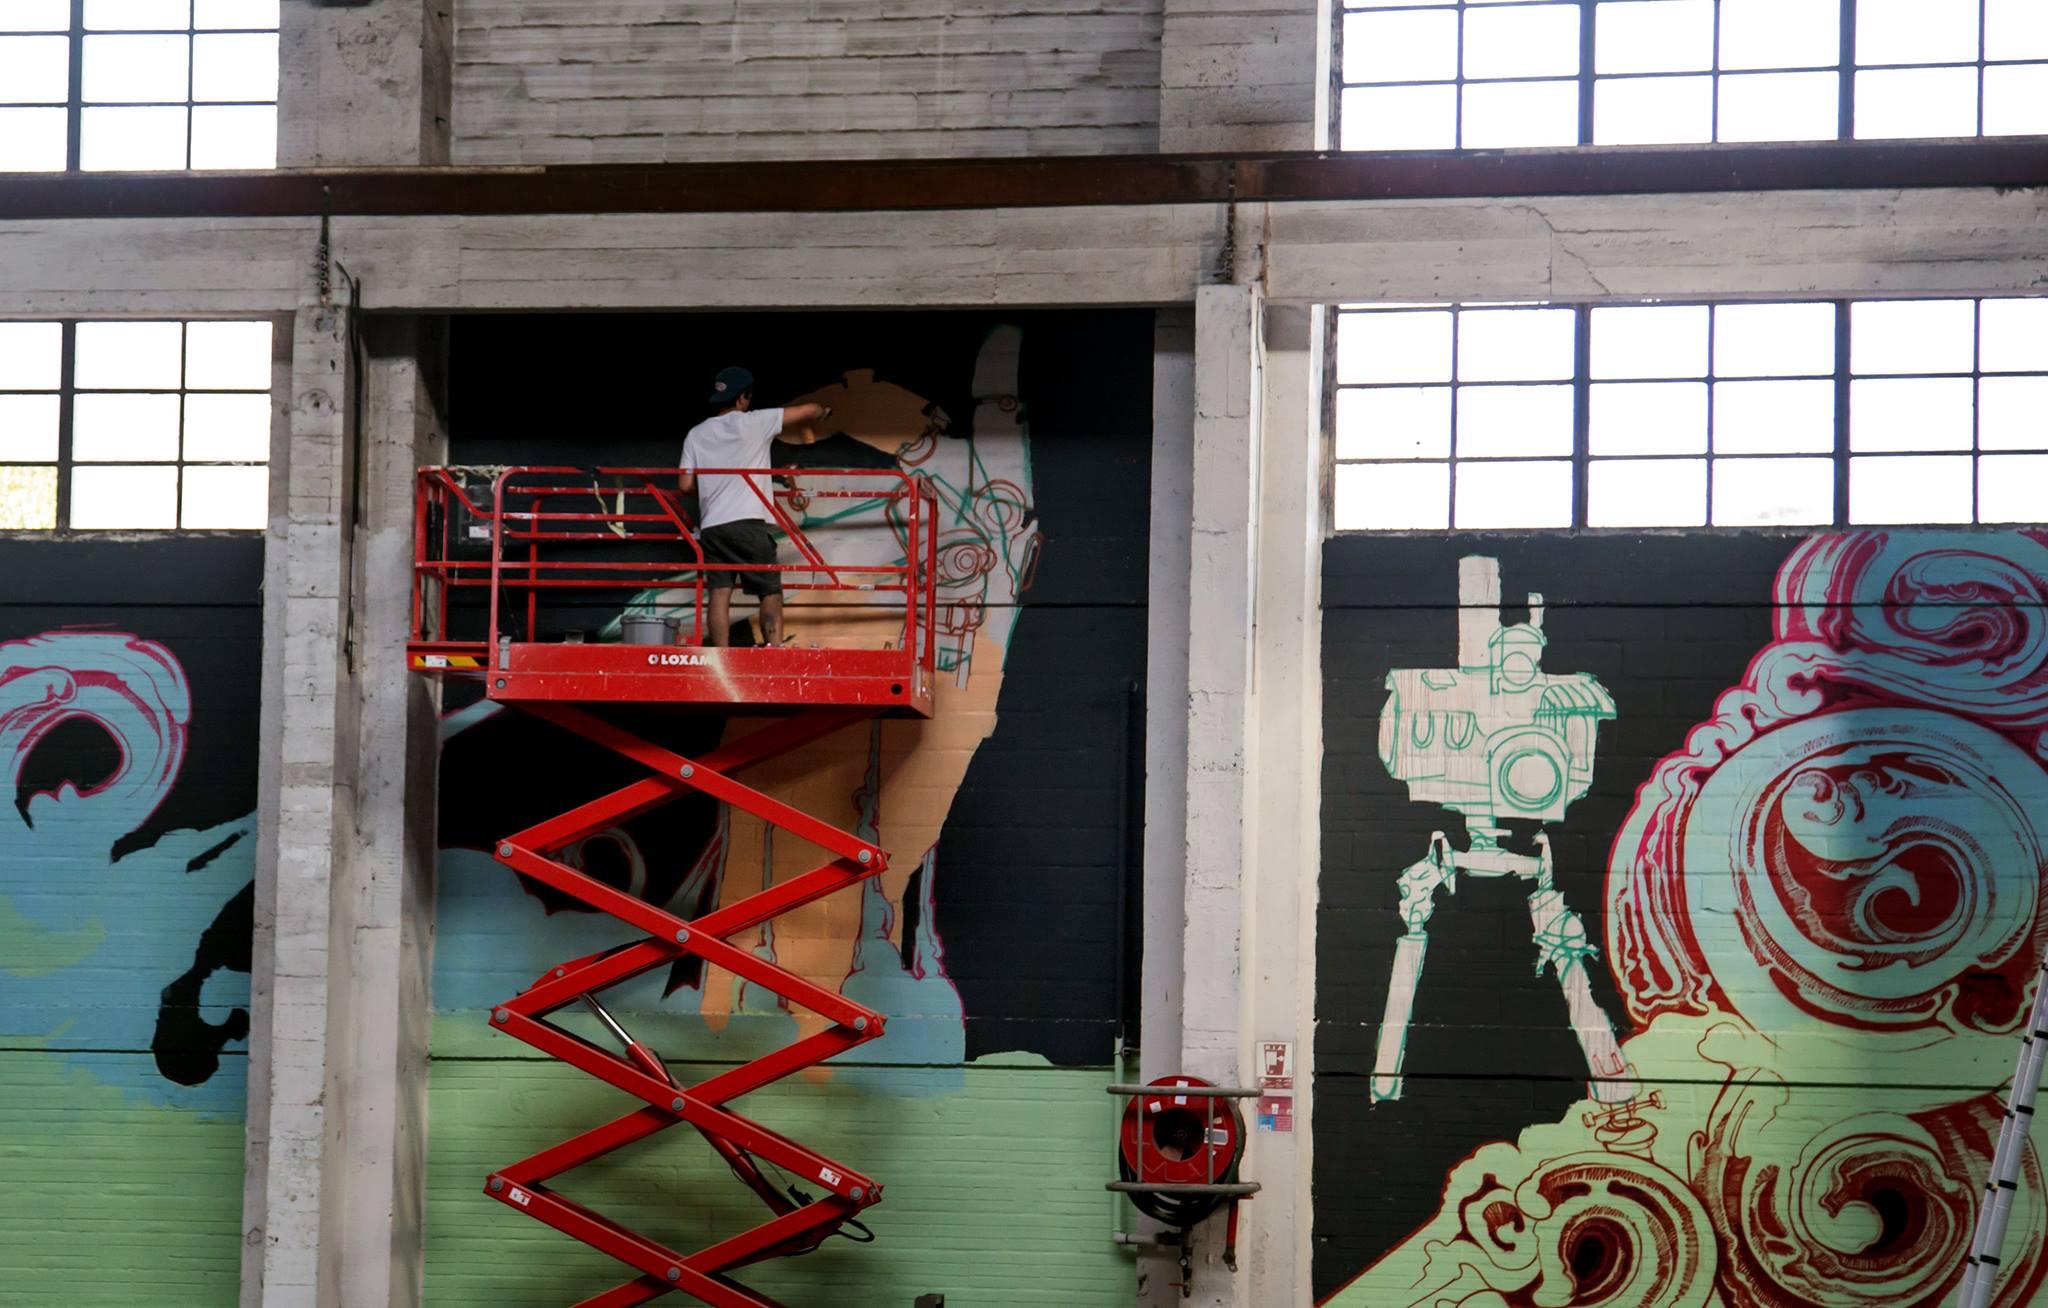 Le street artist Nubian en pleine fresque